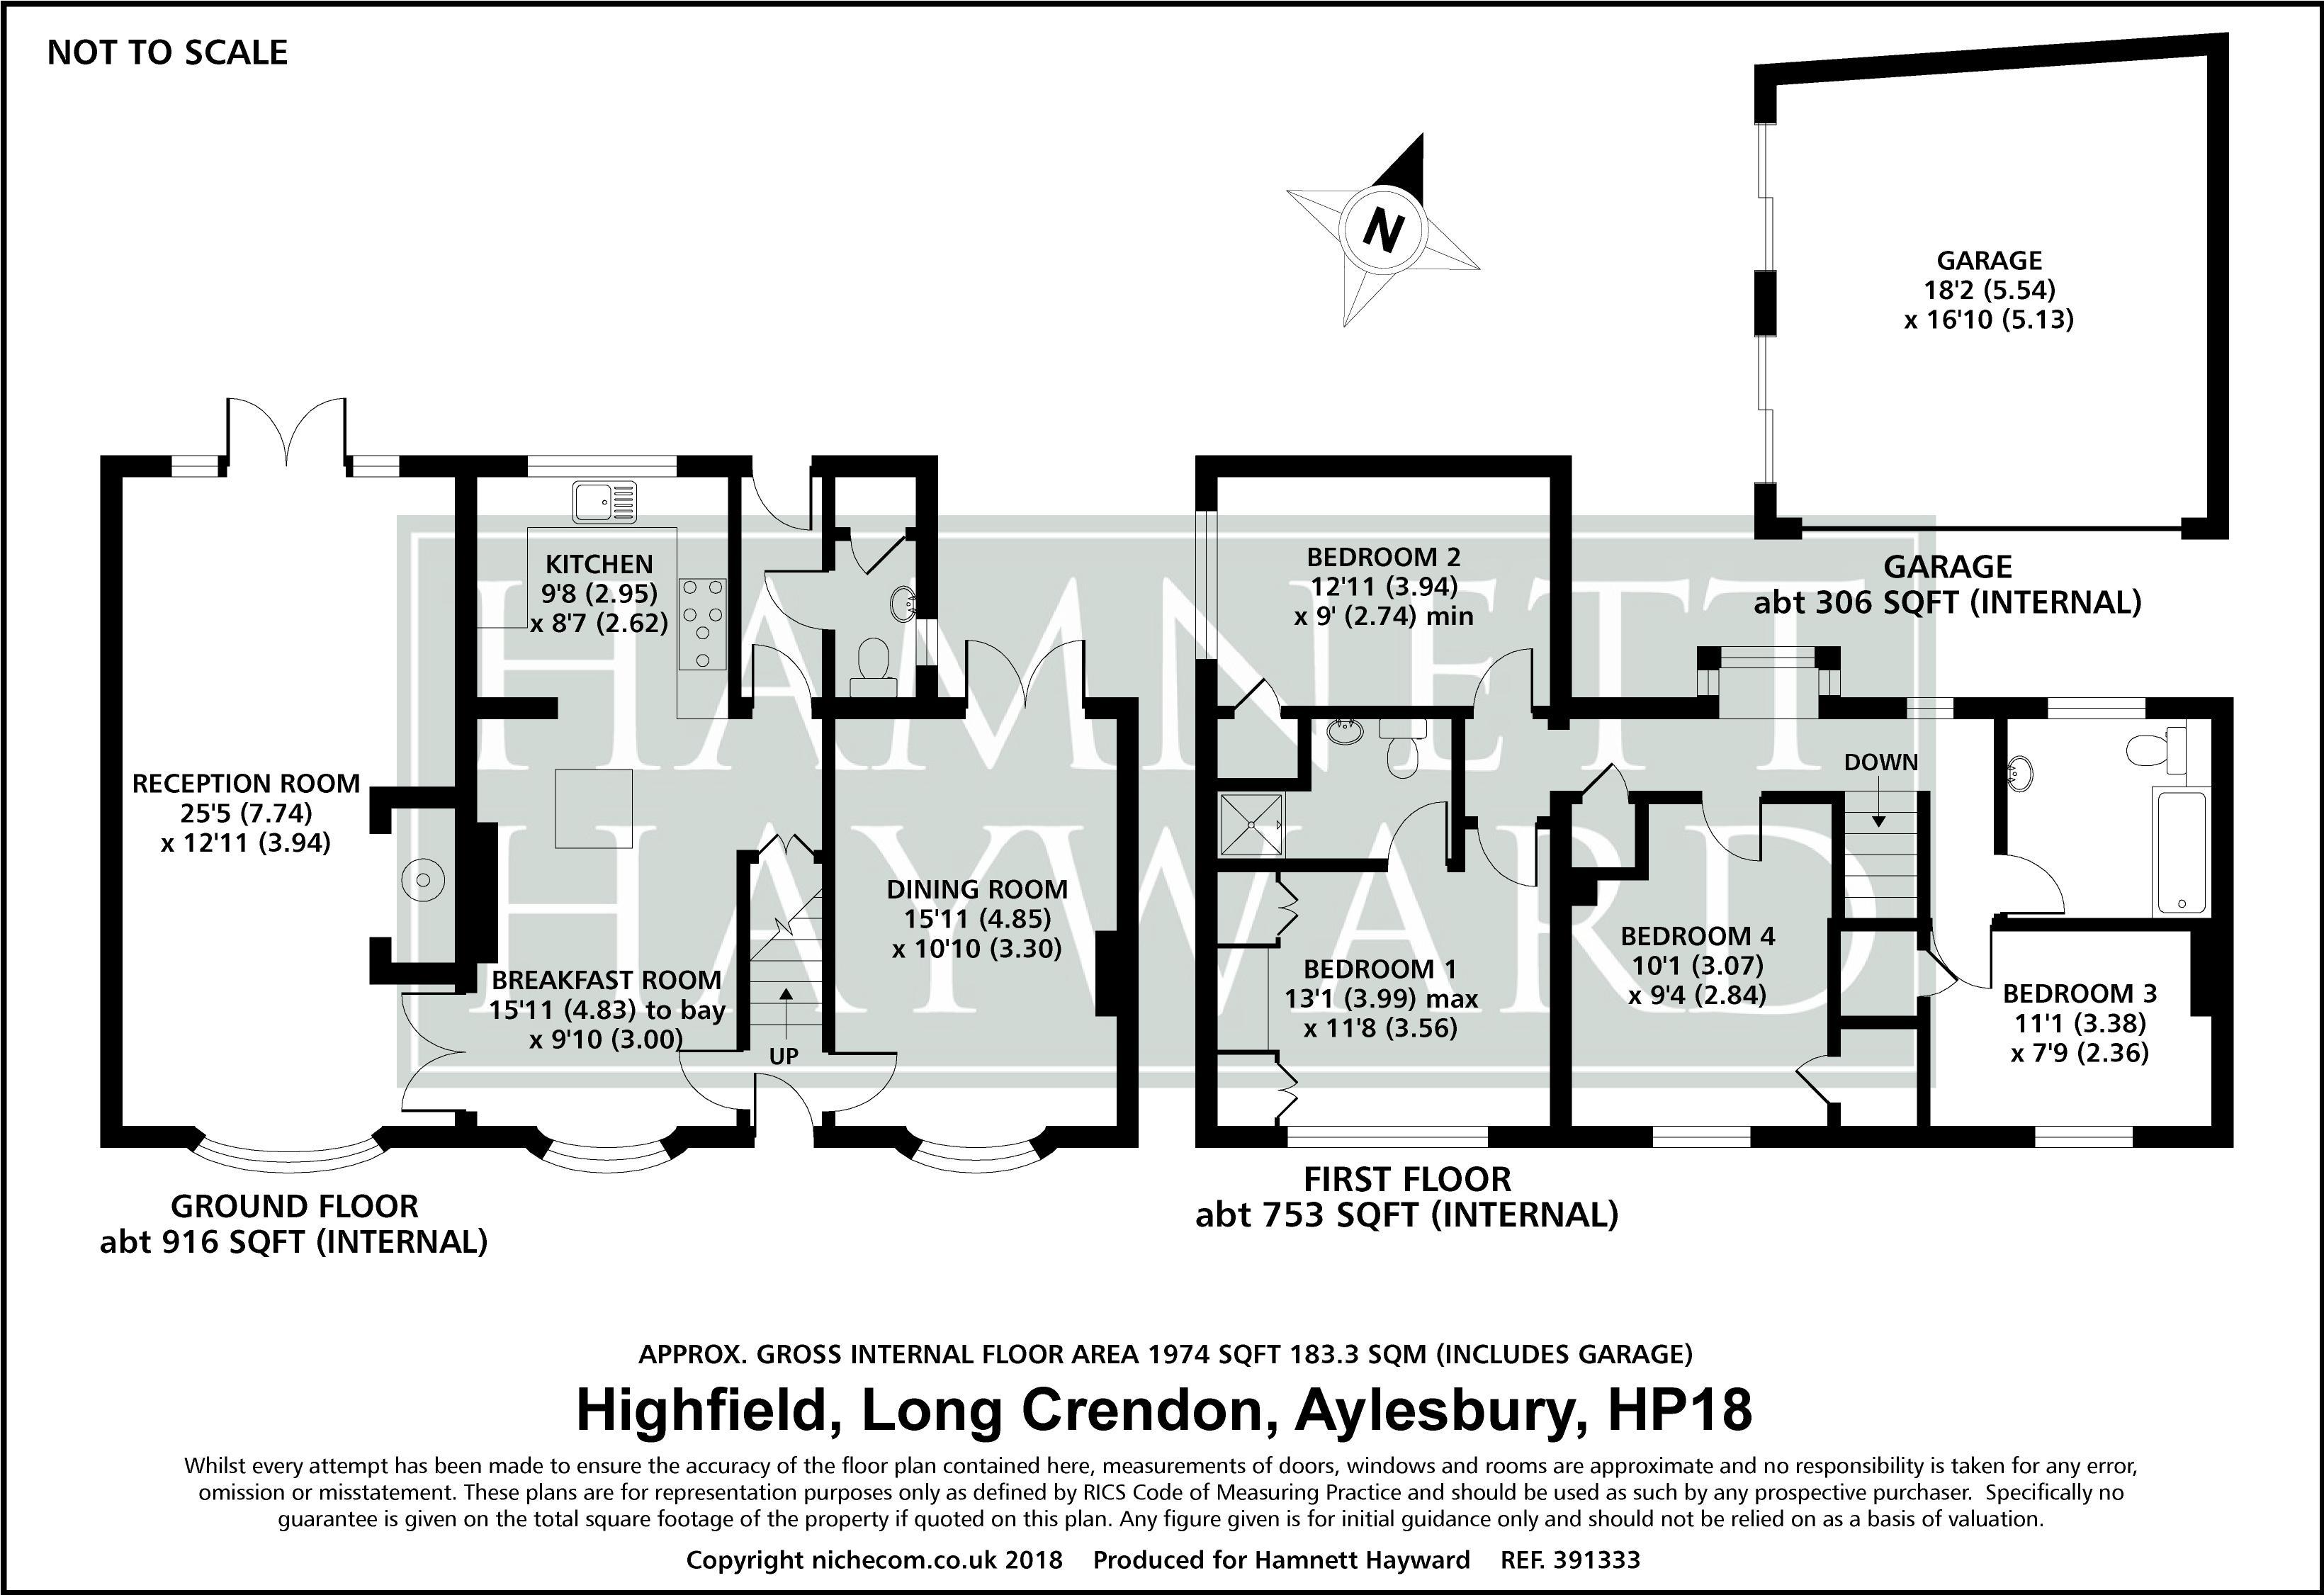 Highfield Long Crendon